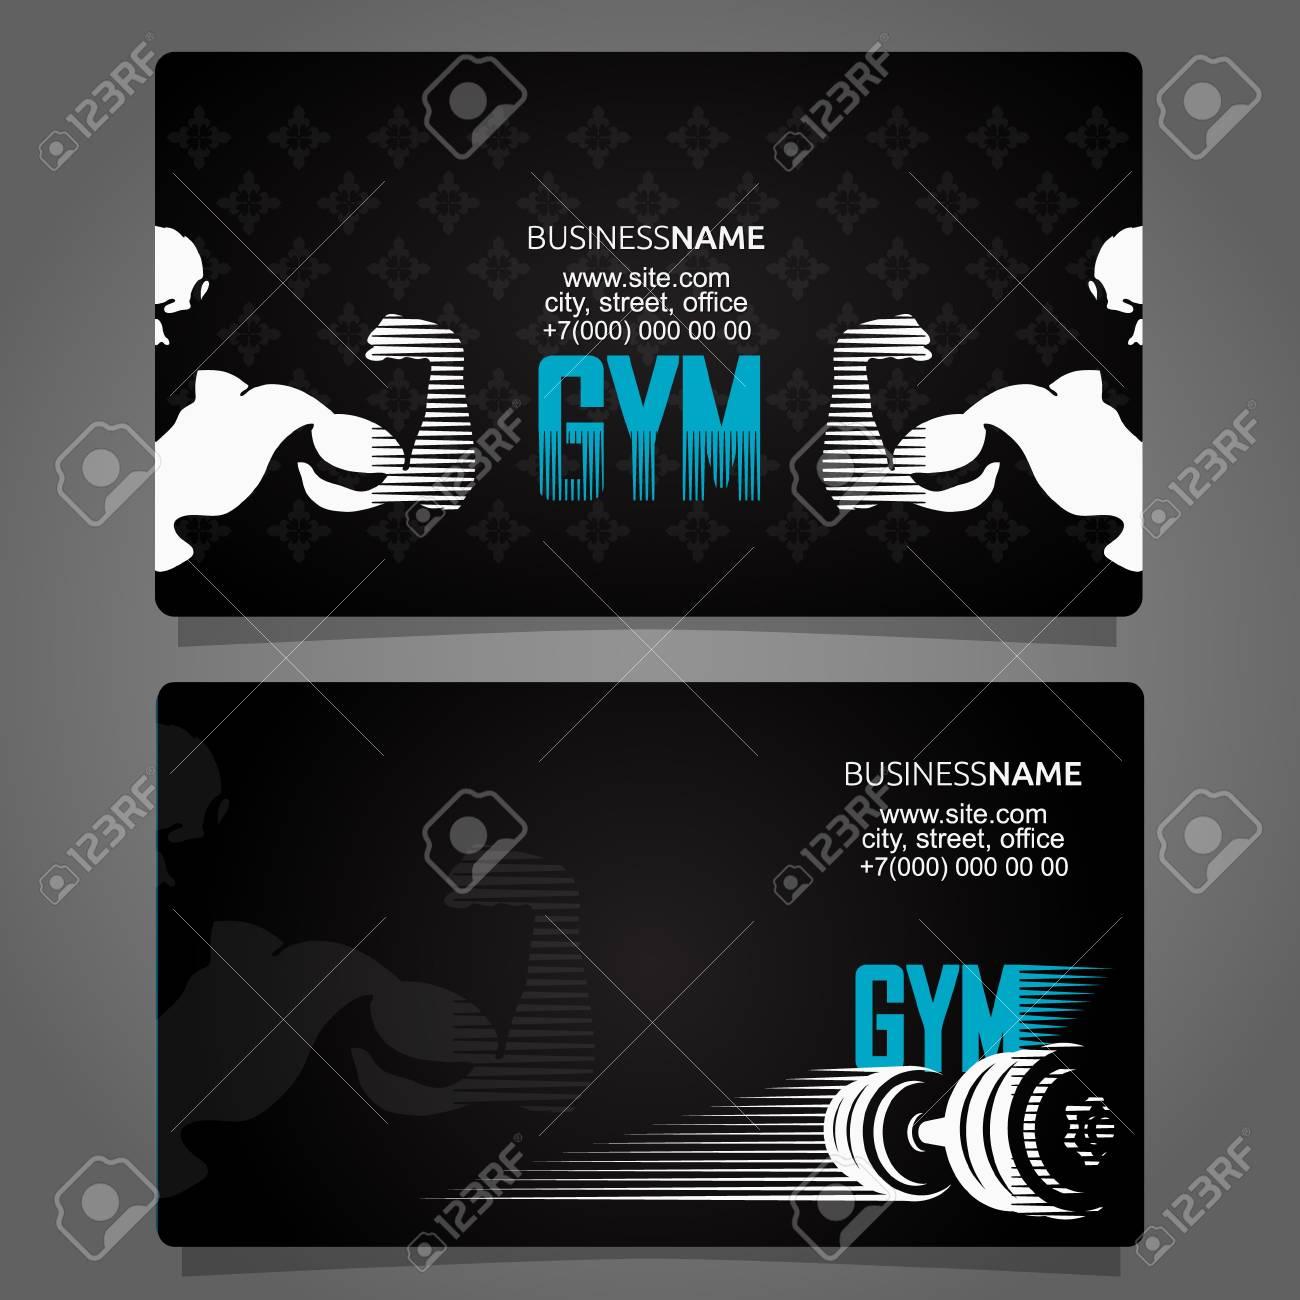 Fitness and gym business card unique concept royalty free cliparts fitness and gym business card unique concept stock vector 105756844 colourmoves